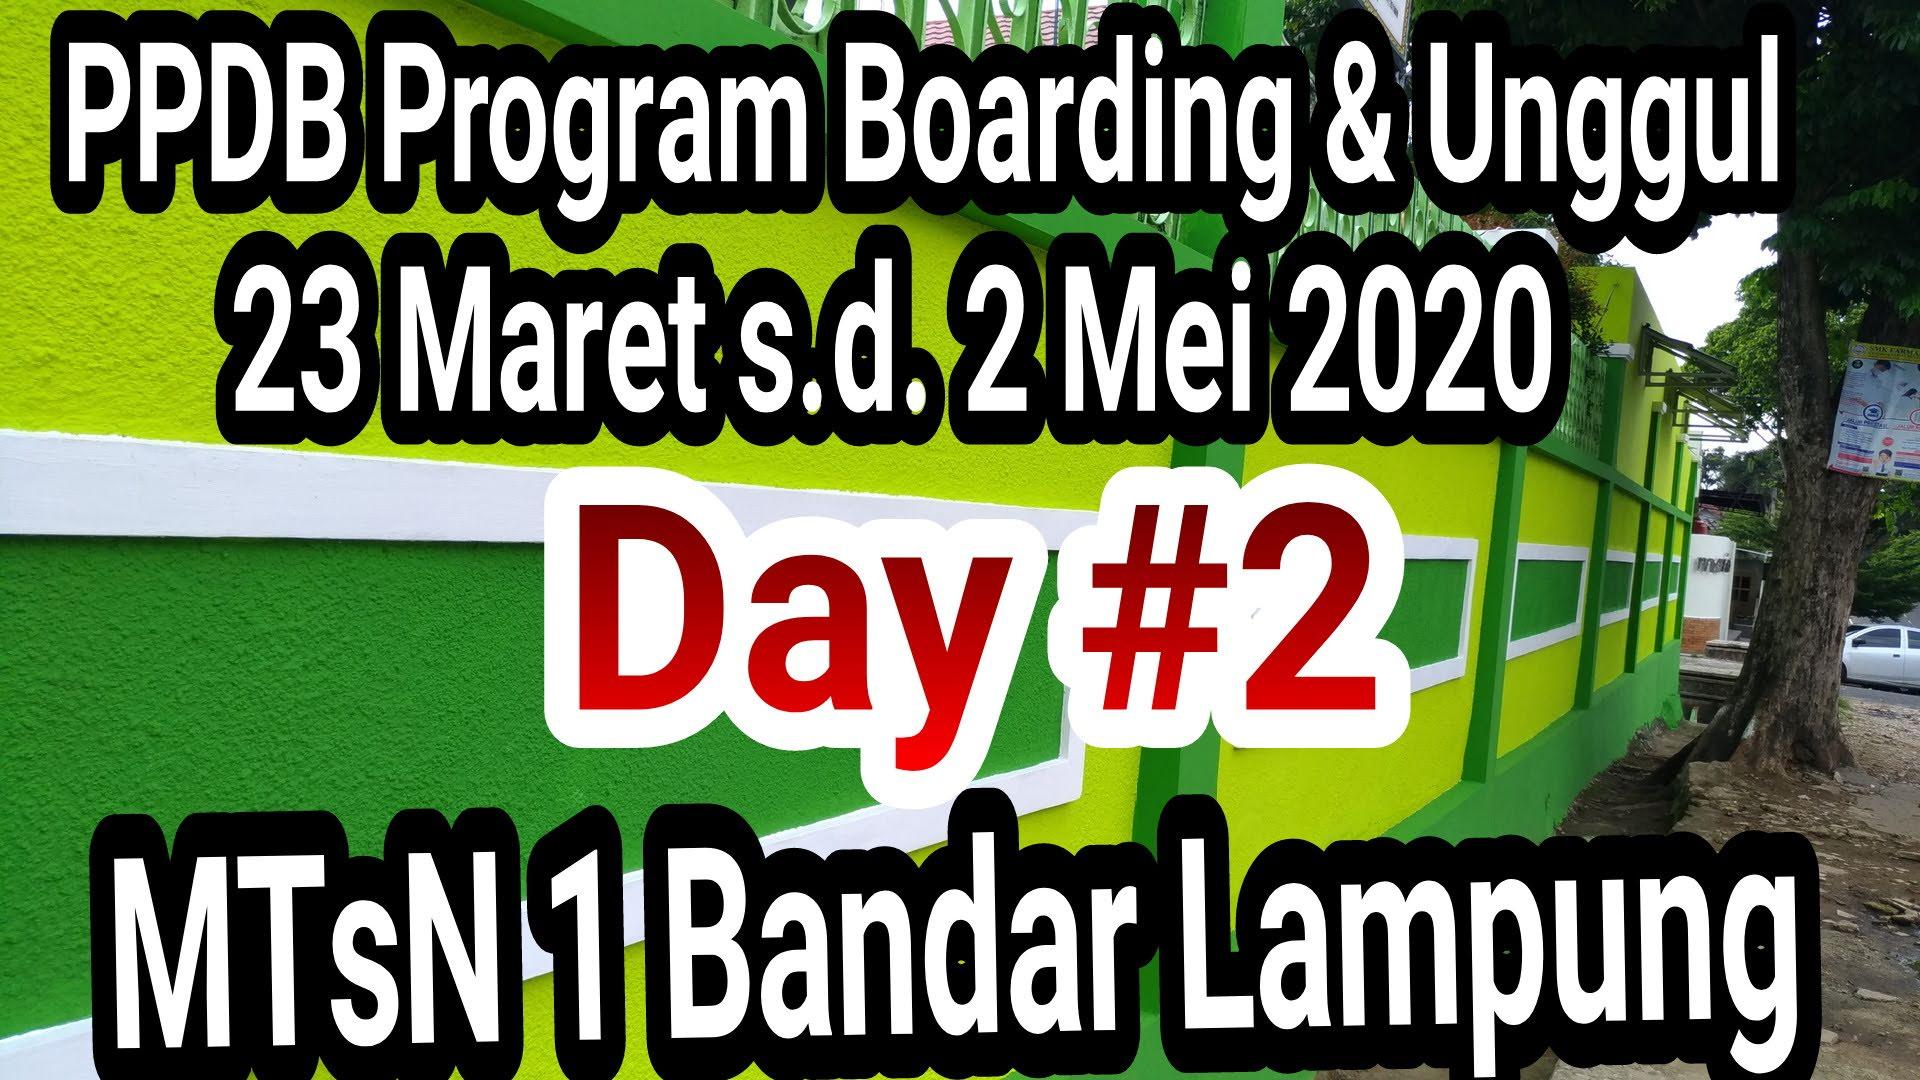 PPDB Online Program Unggul & Boarding Day #2